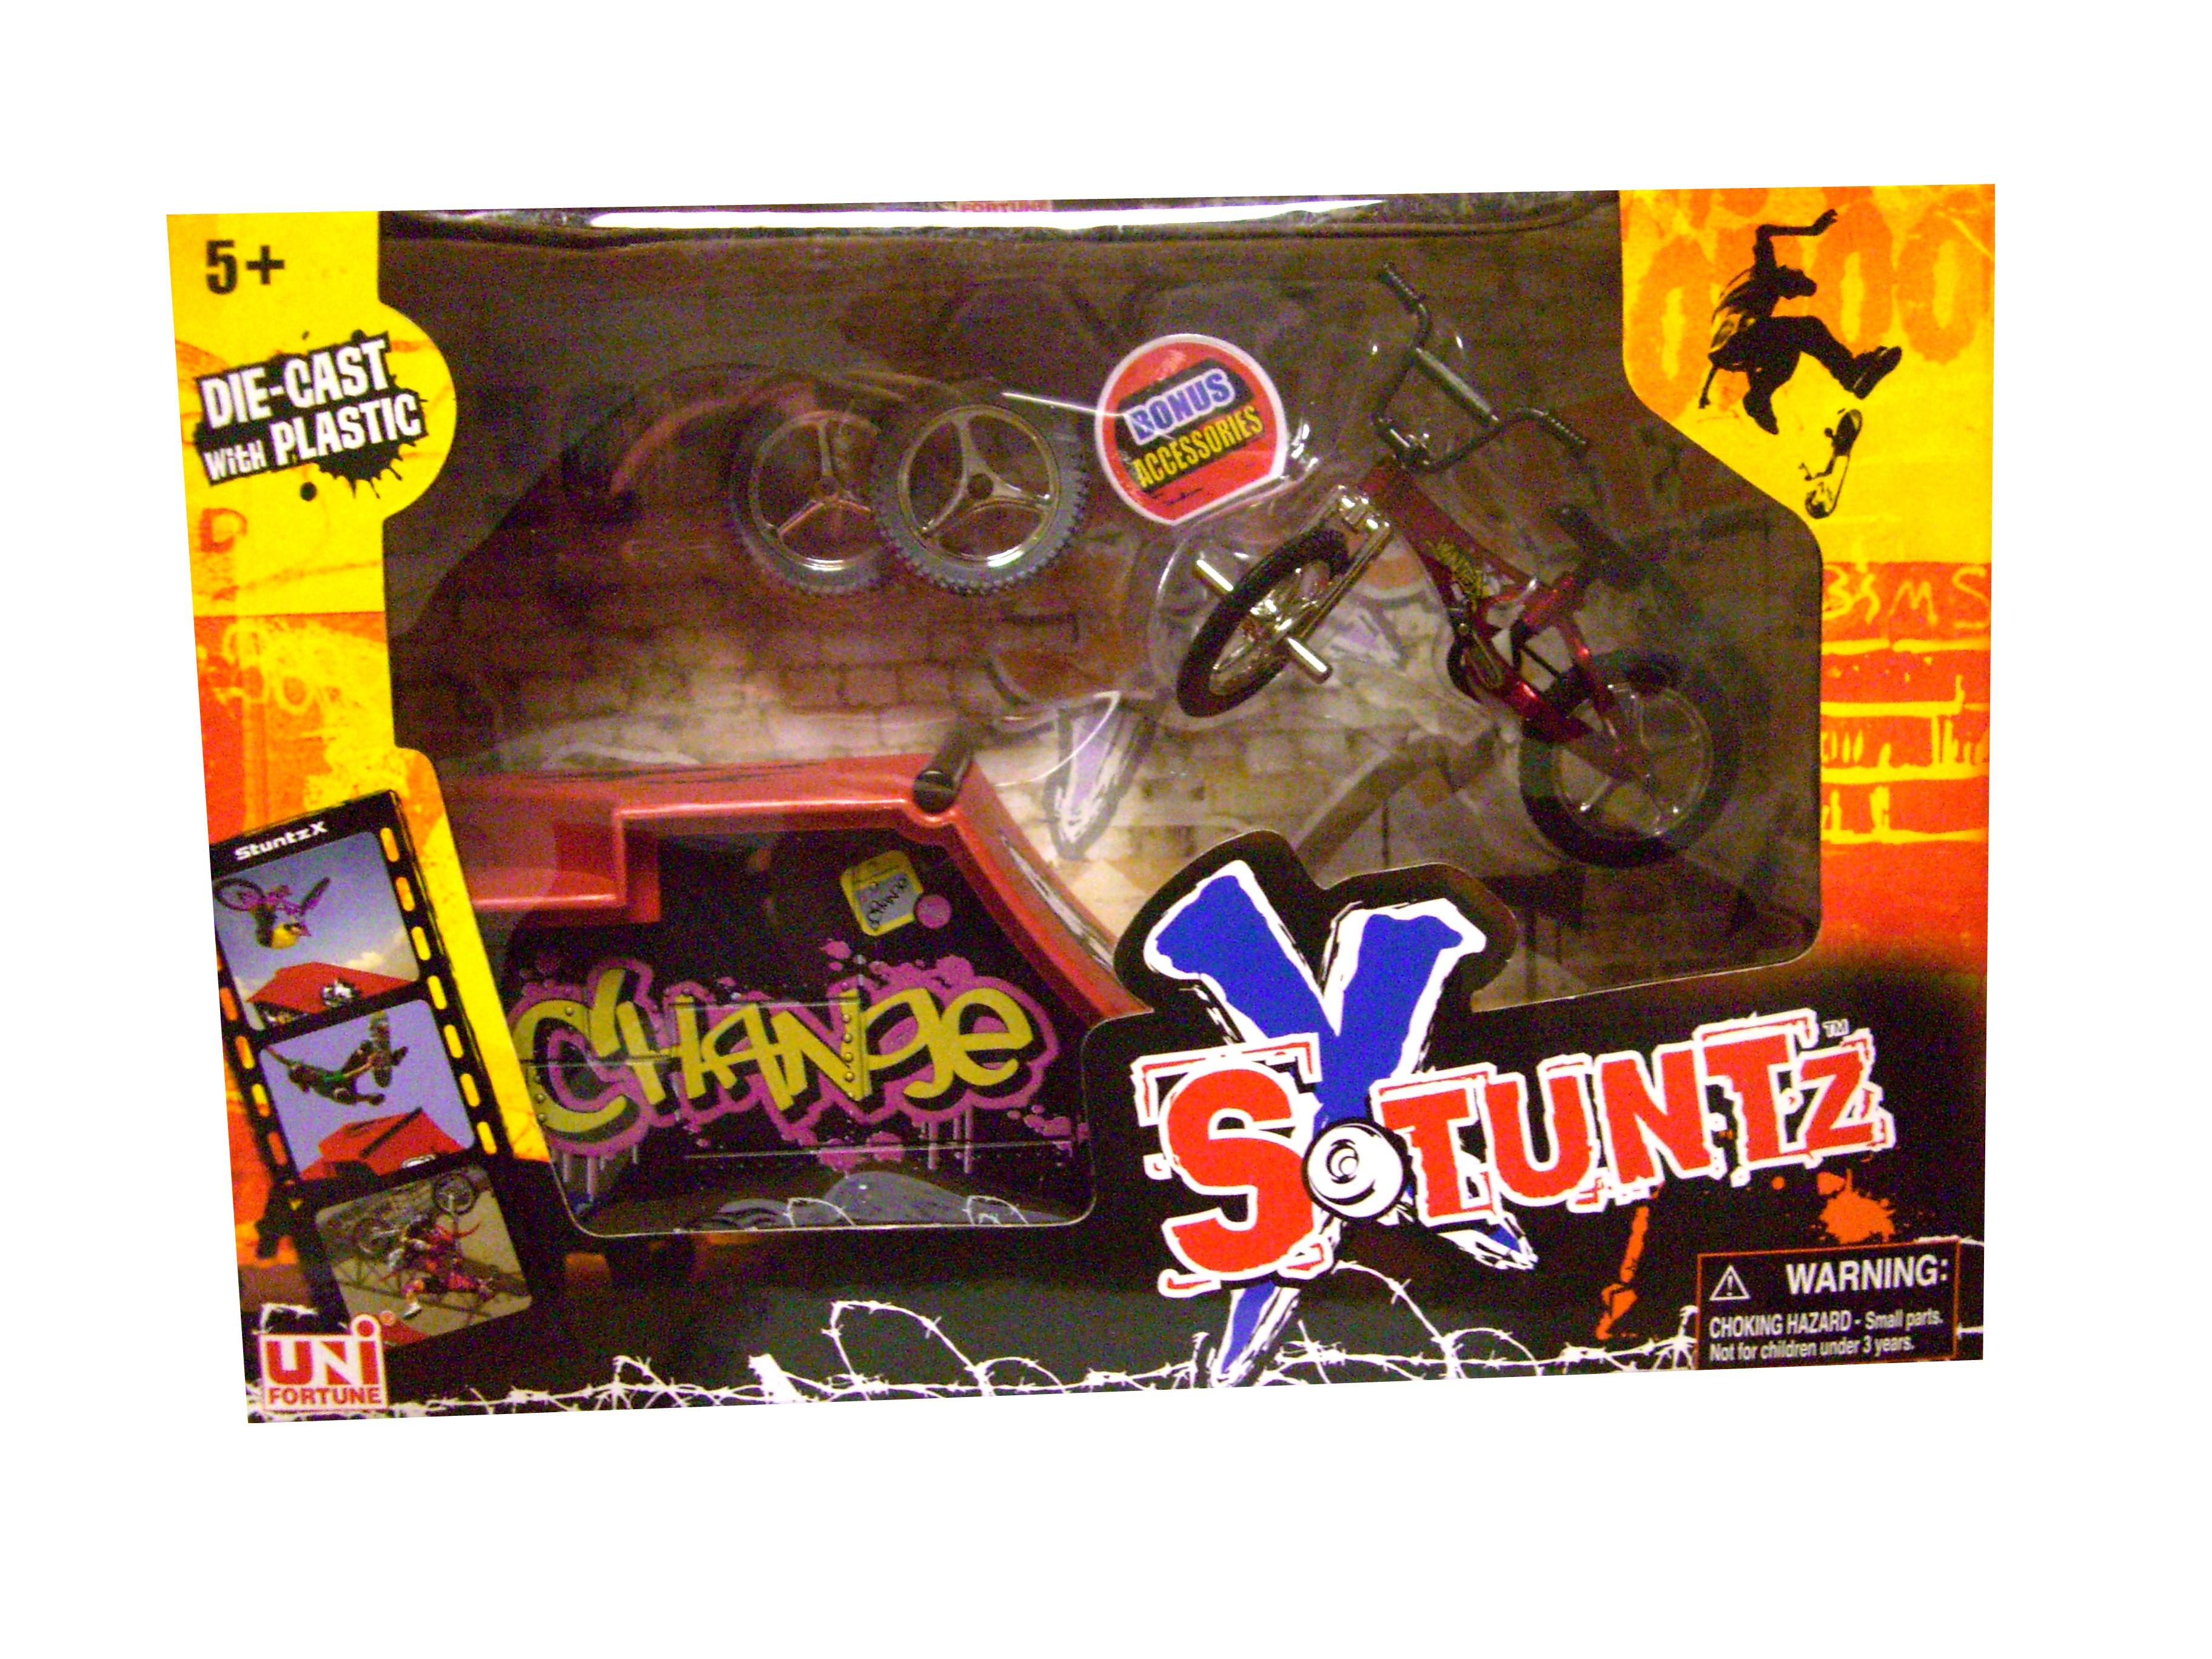 Stuntz-X-Toy-Skate-Bike-Park-Mini-Stunt-Bike-Ramp-C-Set-Asst-Colours